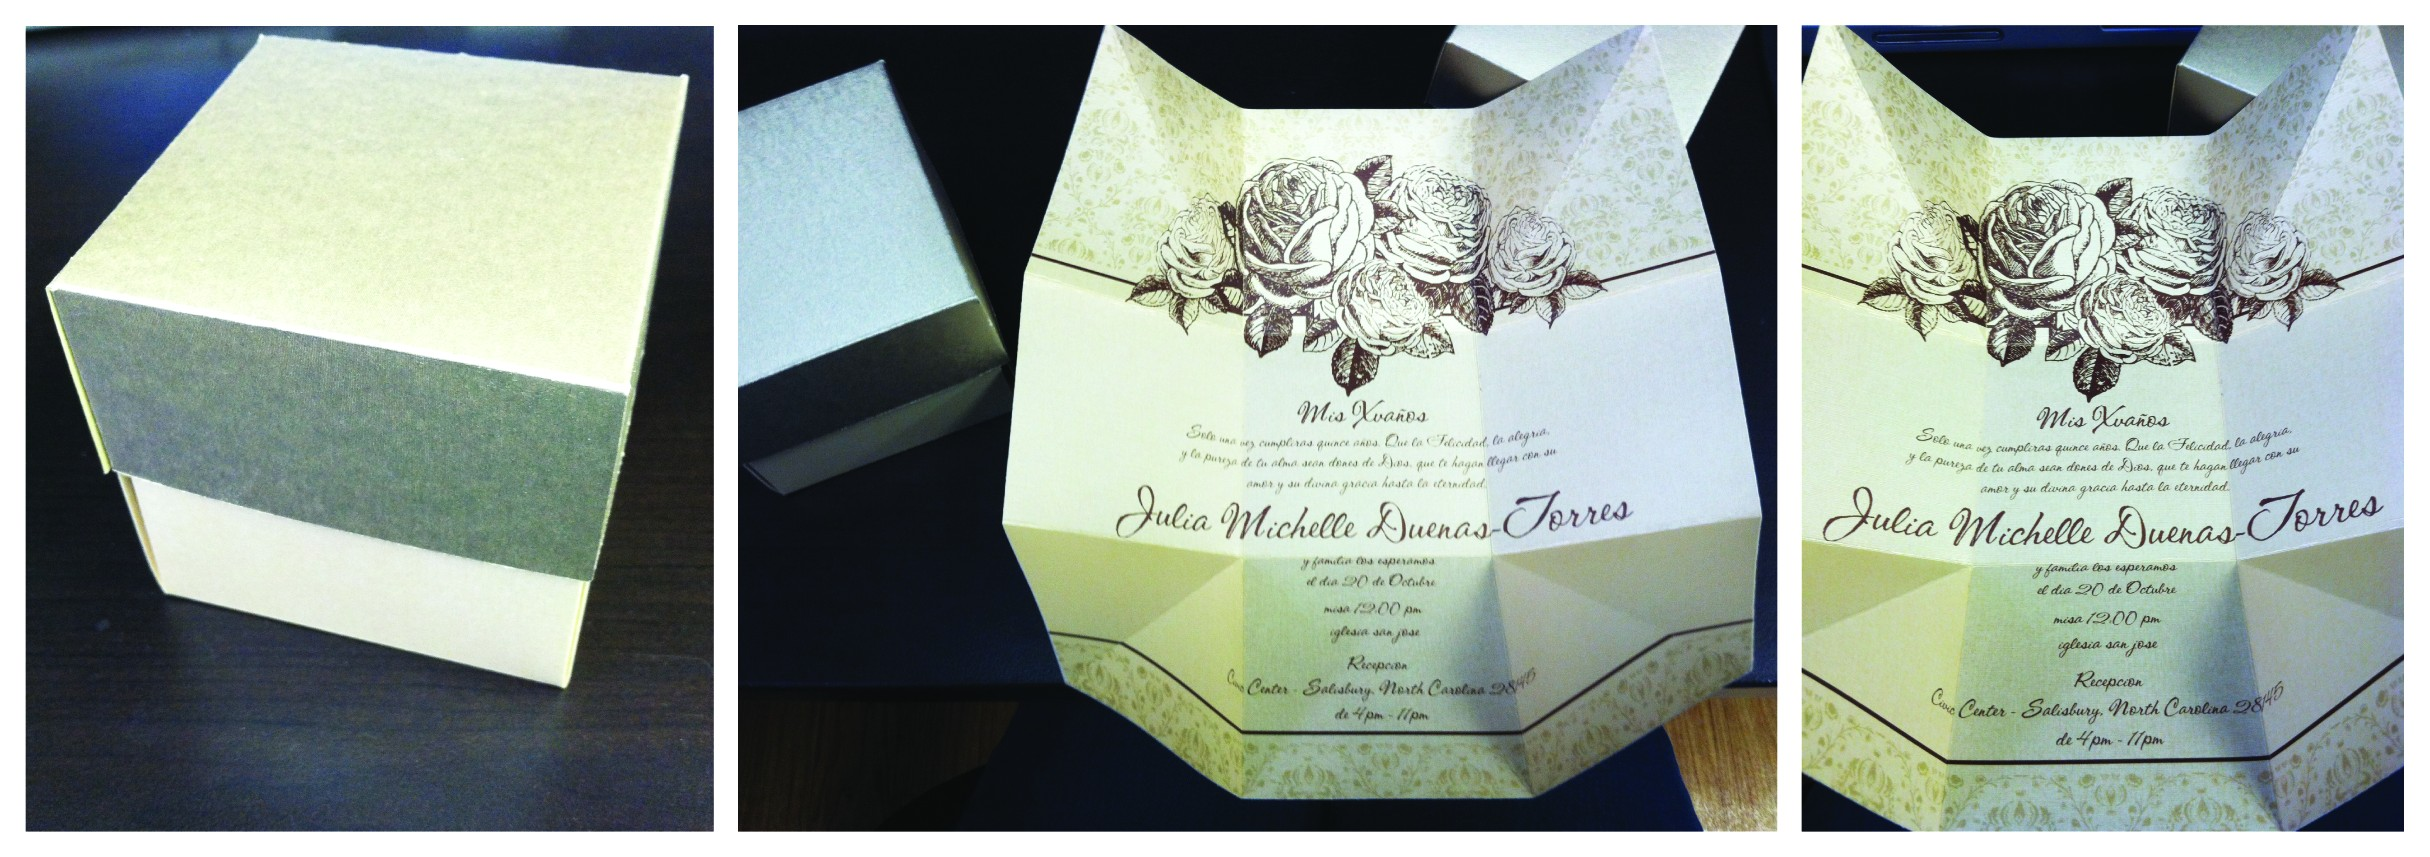 quinceanera box invitations